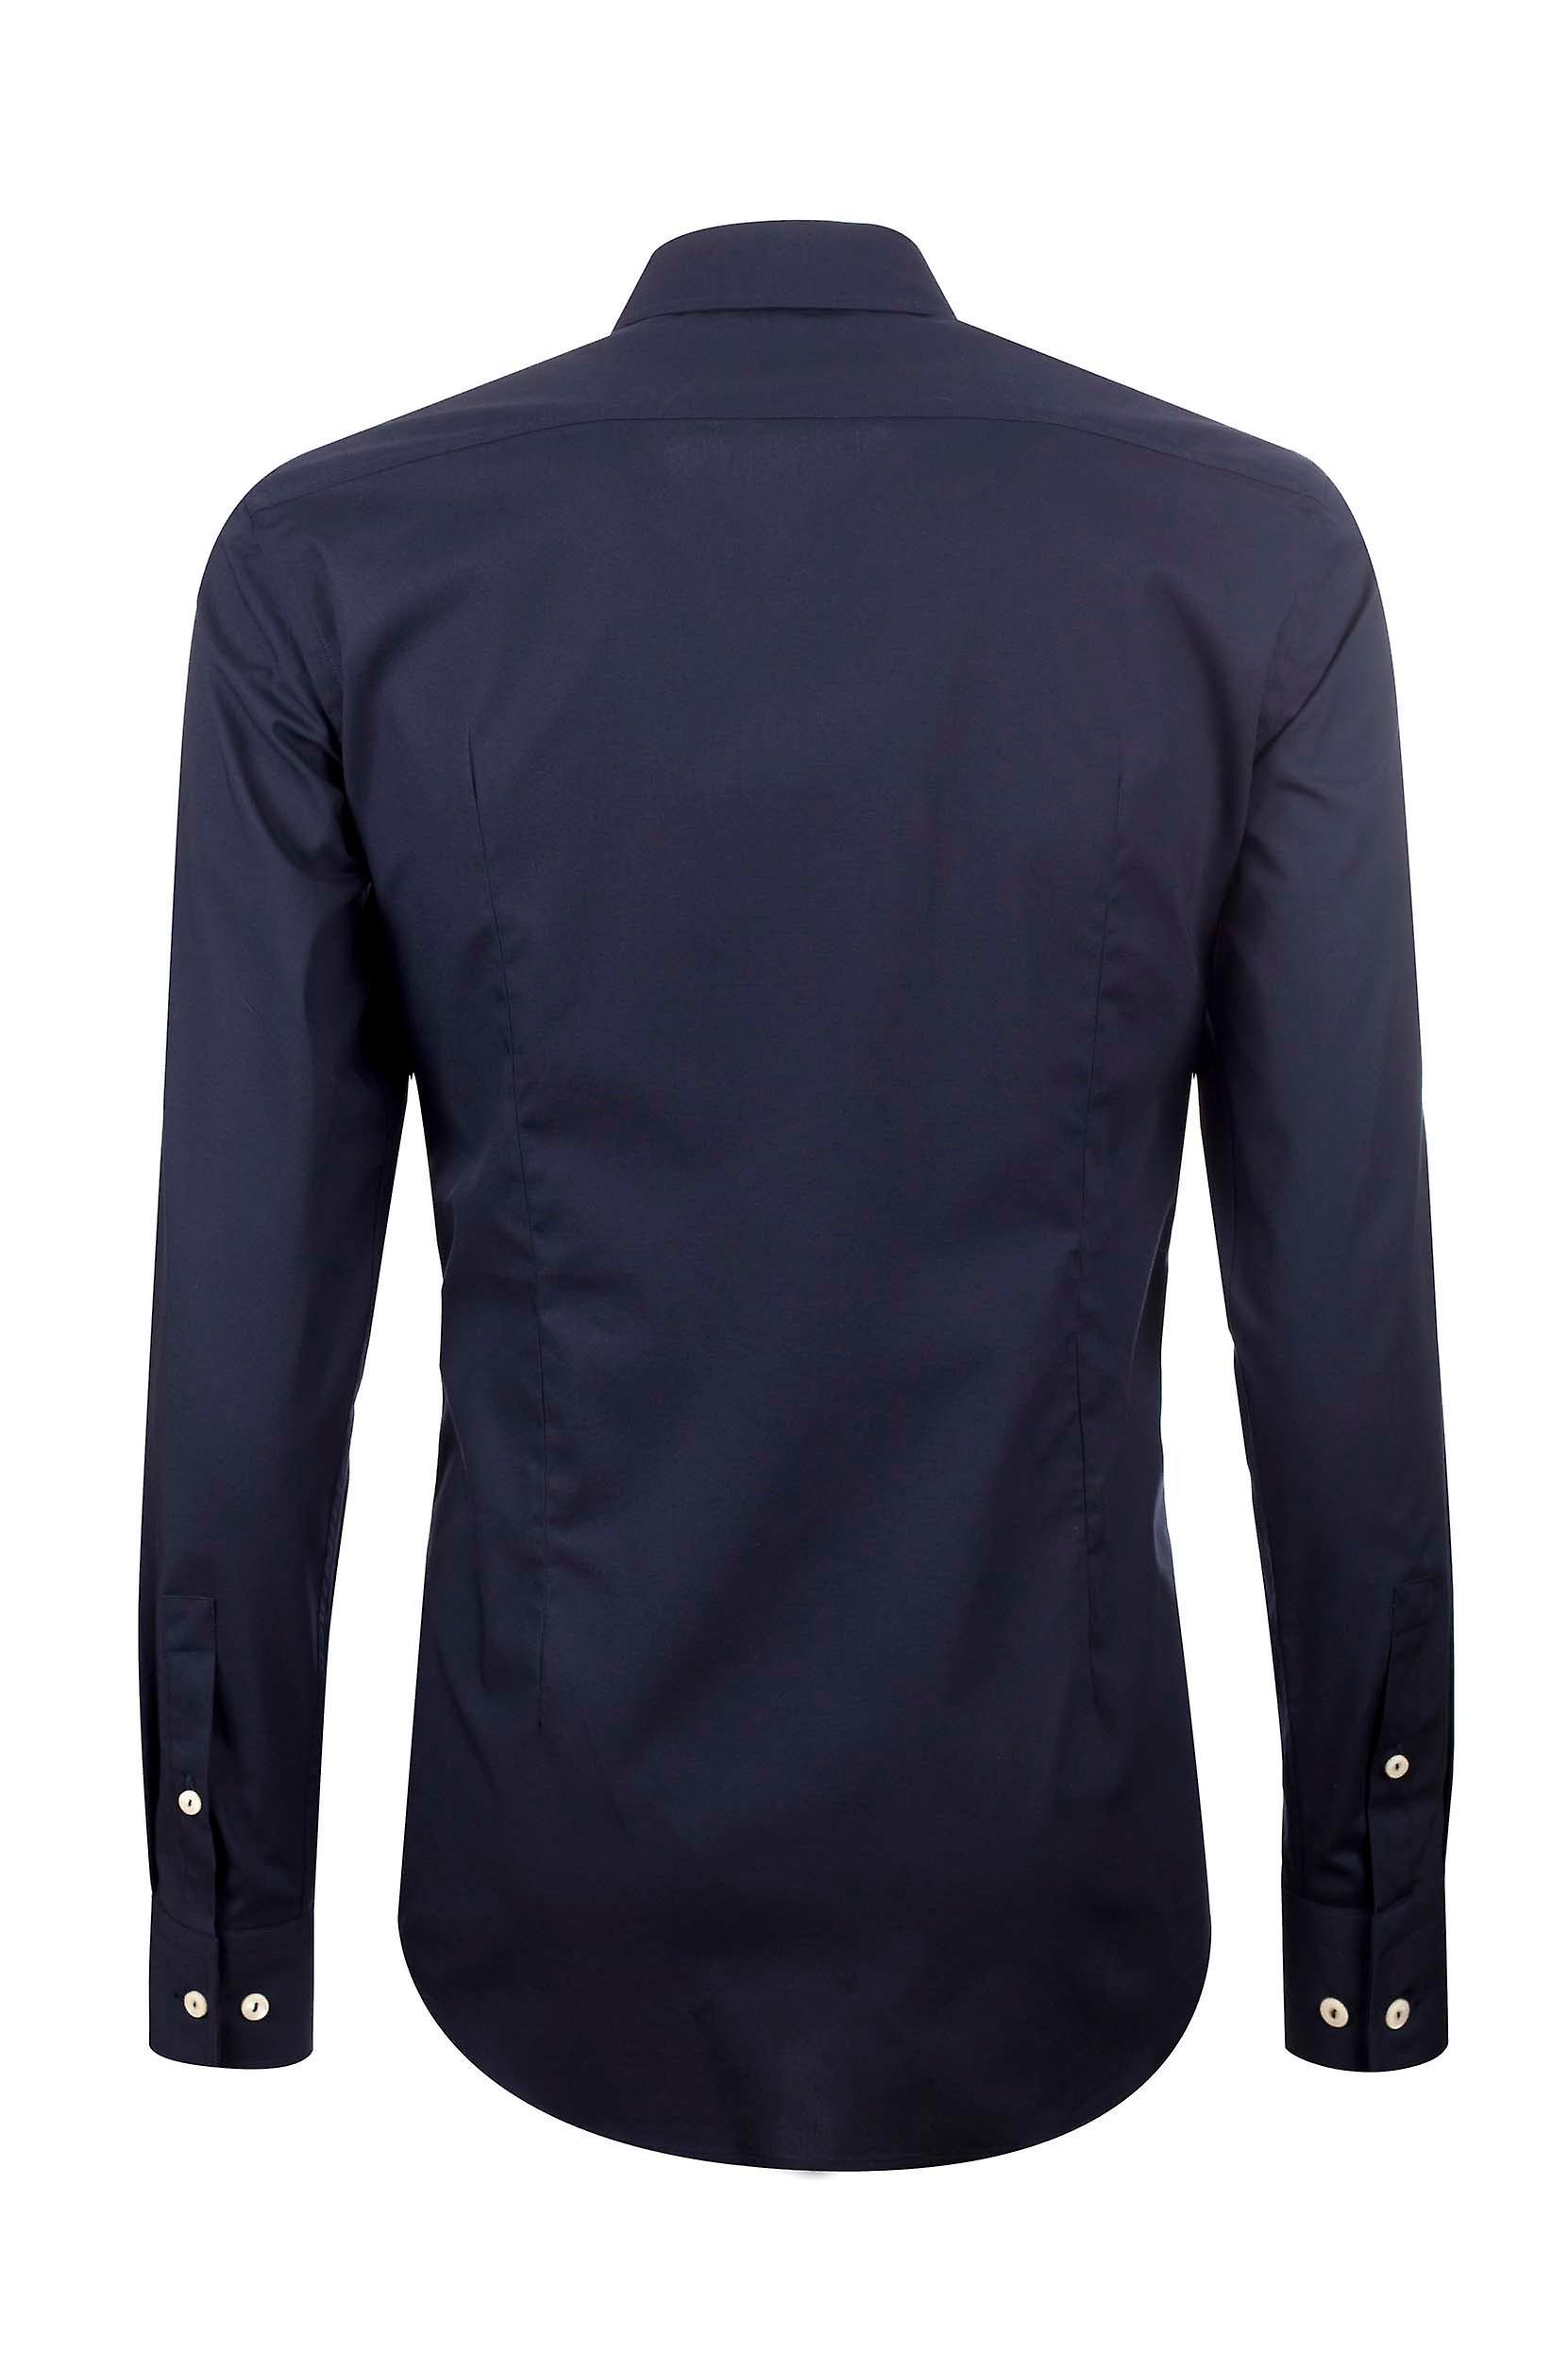 Fabio Giovanni Massimo Shirt - Black Stretch Cotton with Soft Collar Italian Shirt